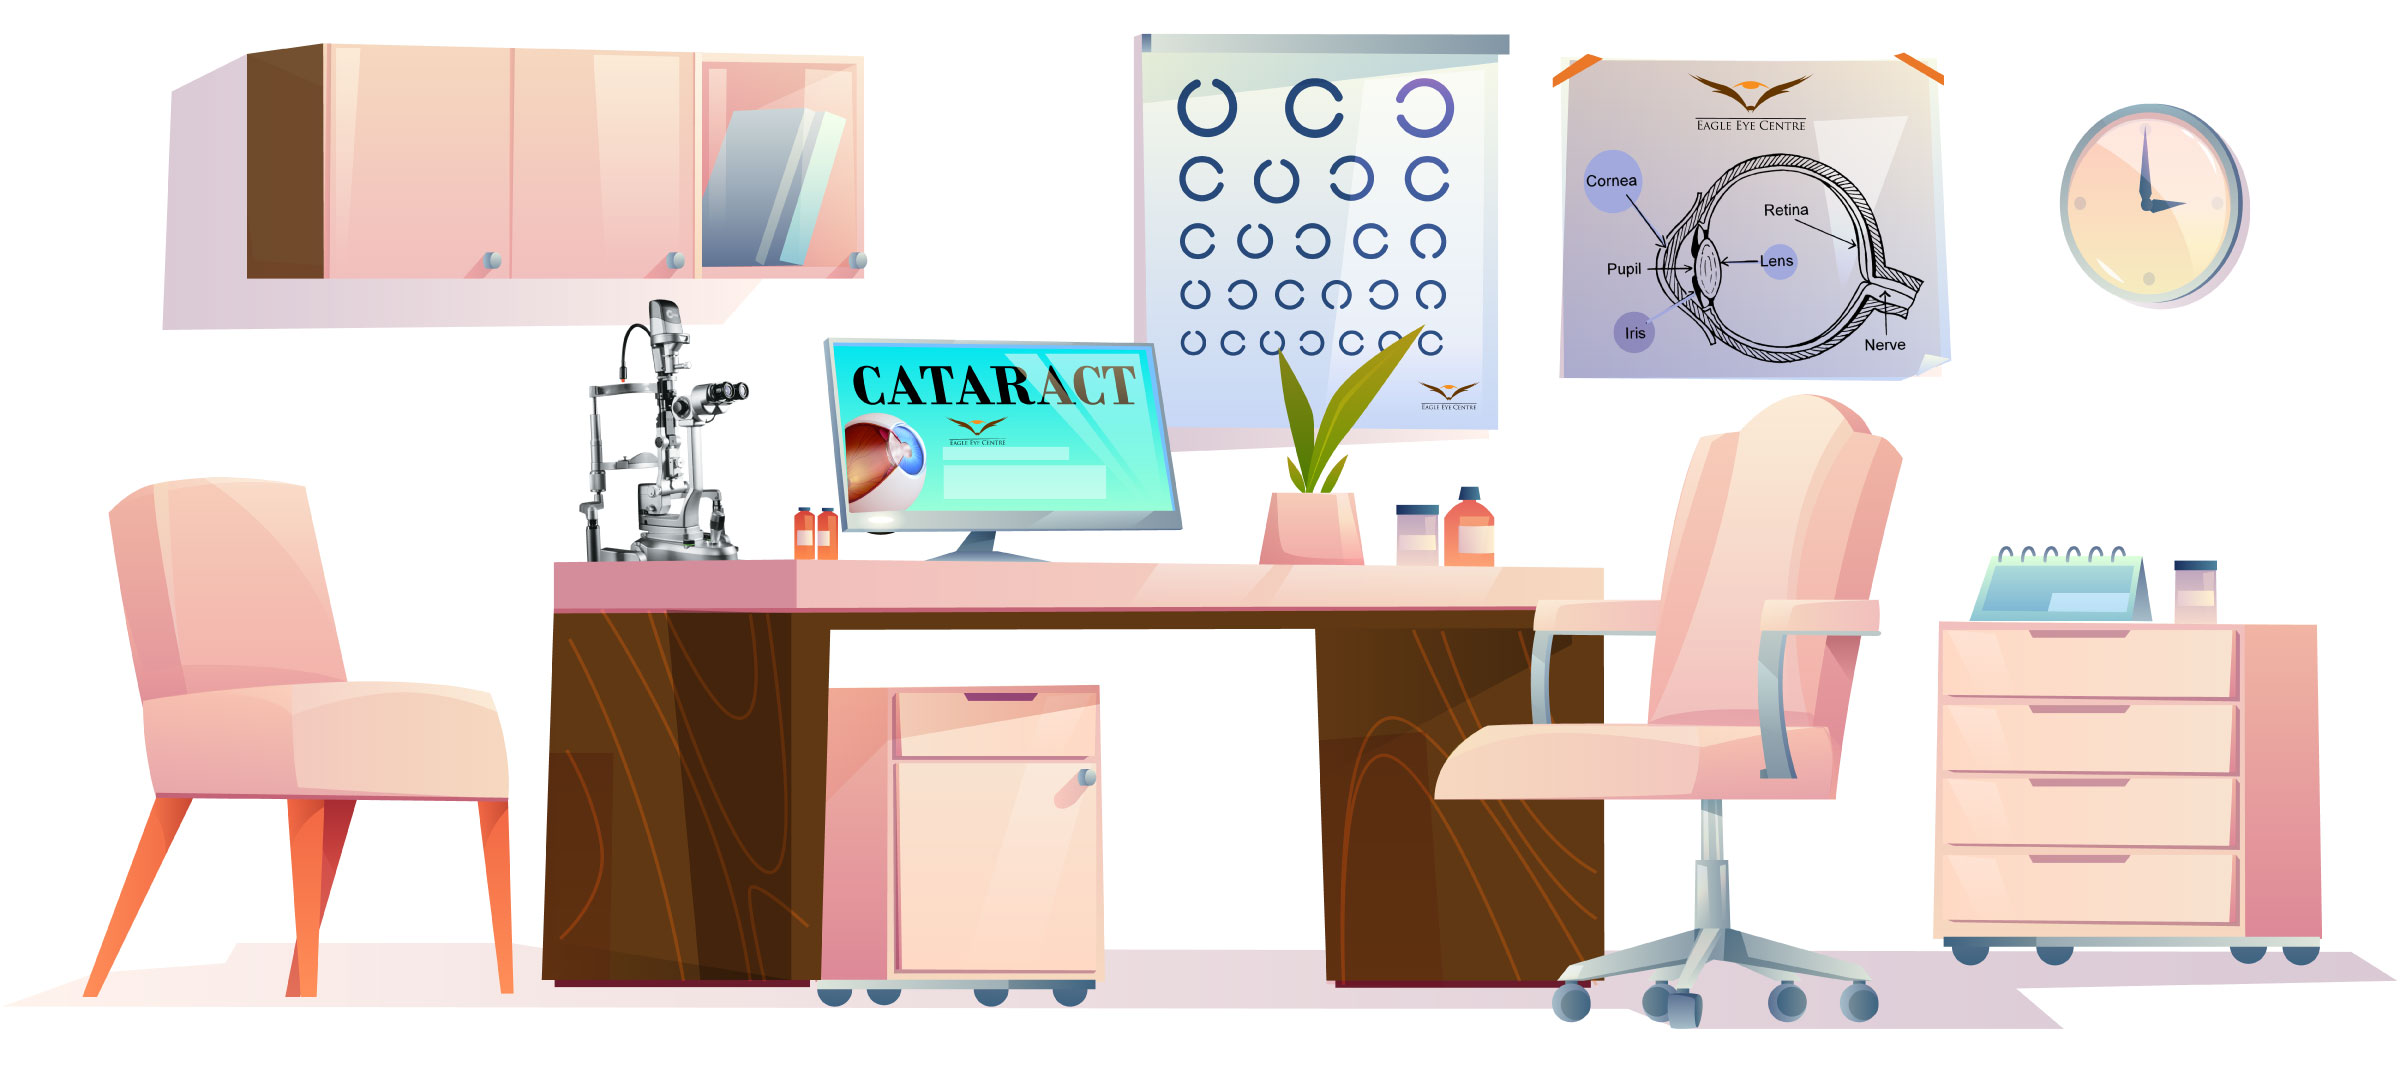 Image of eye clinic